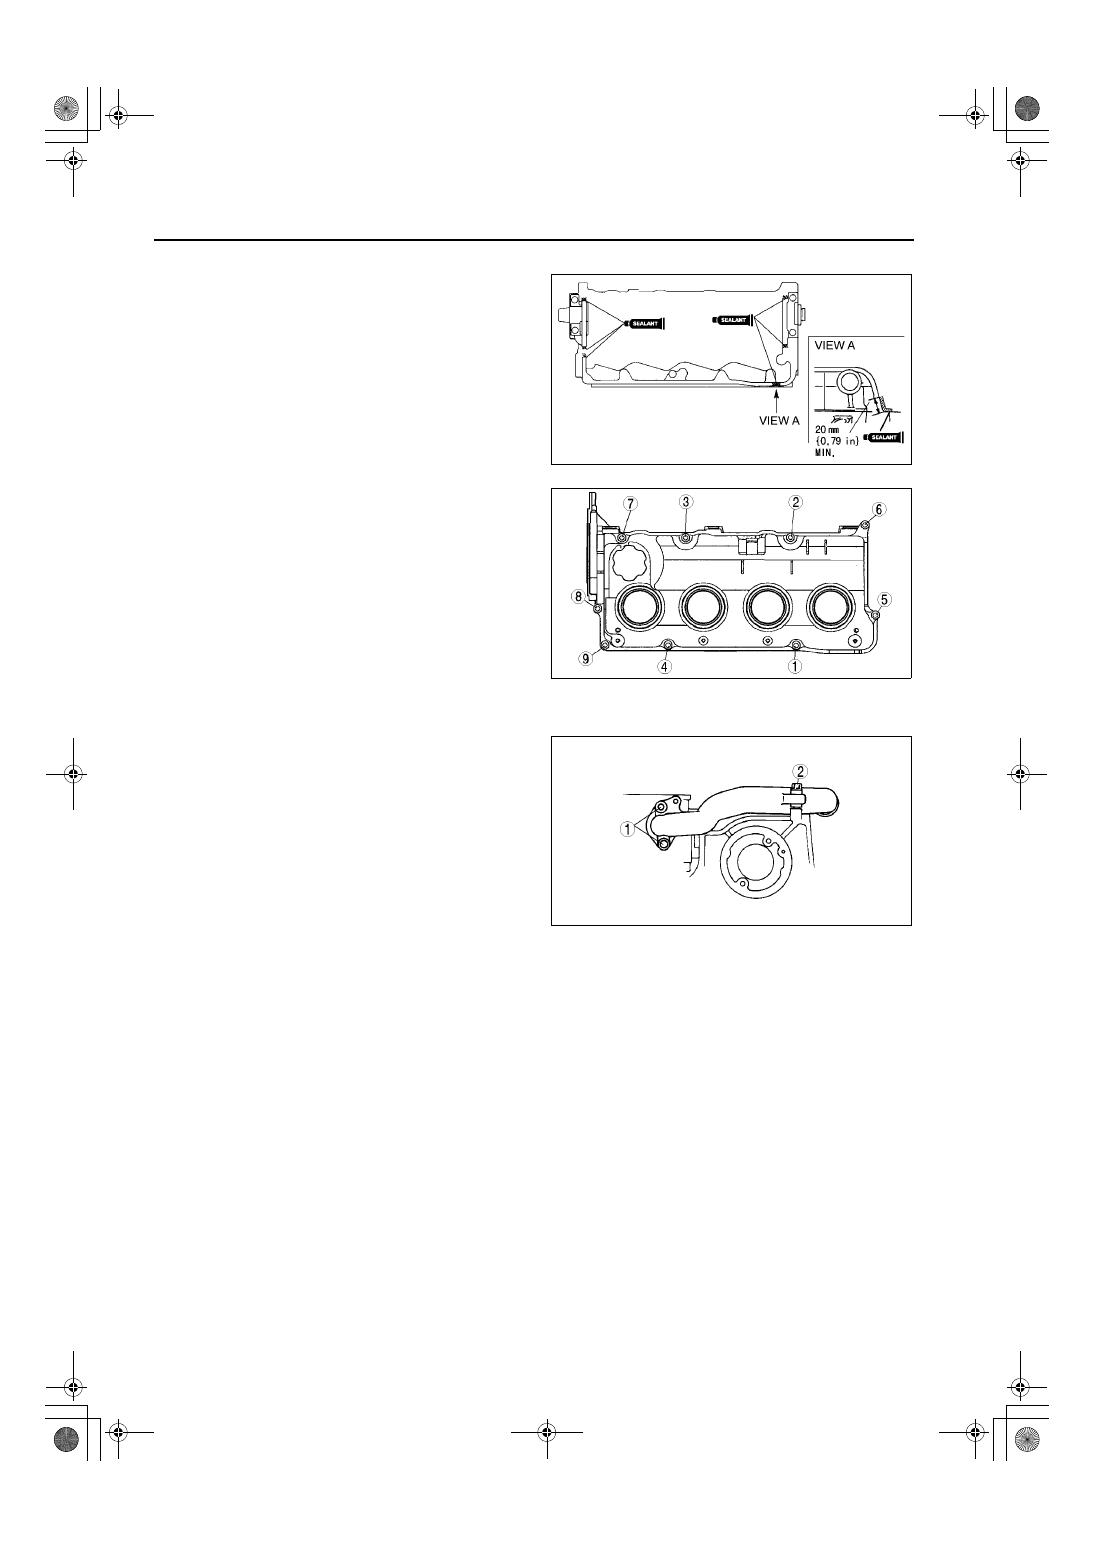 Mazda 3 Service Manual: Engine DisassemblyAssembly Mzr 2.0, Mzr 2.5